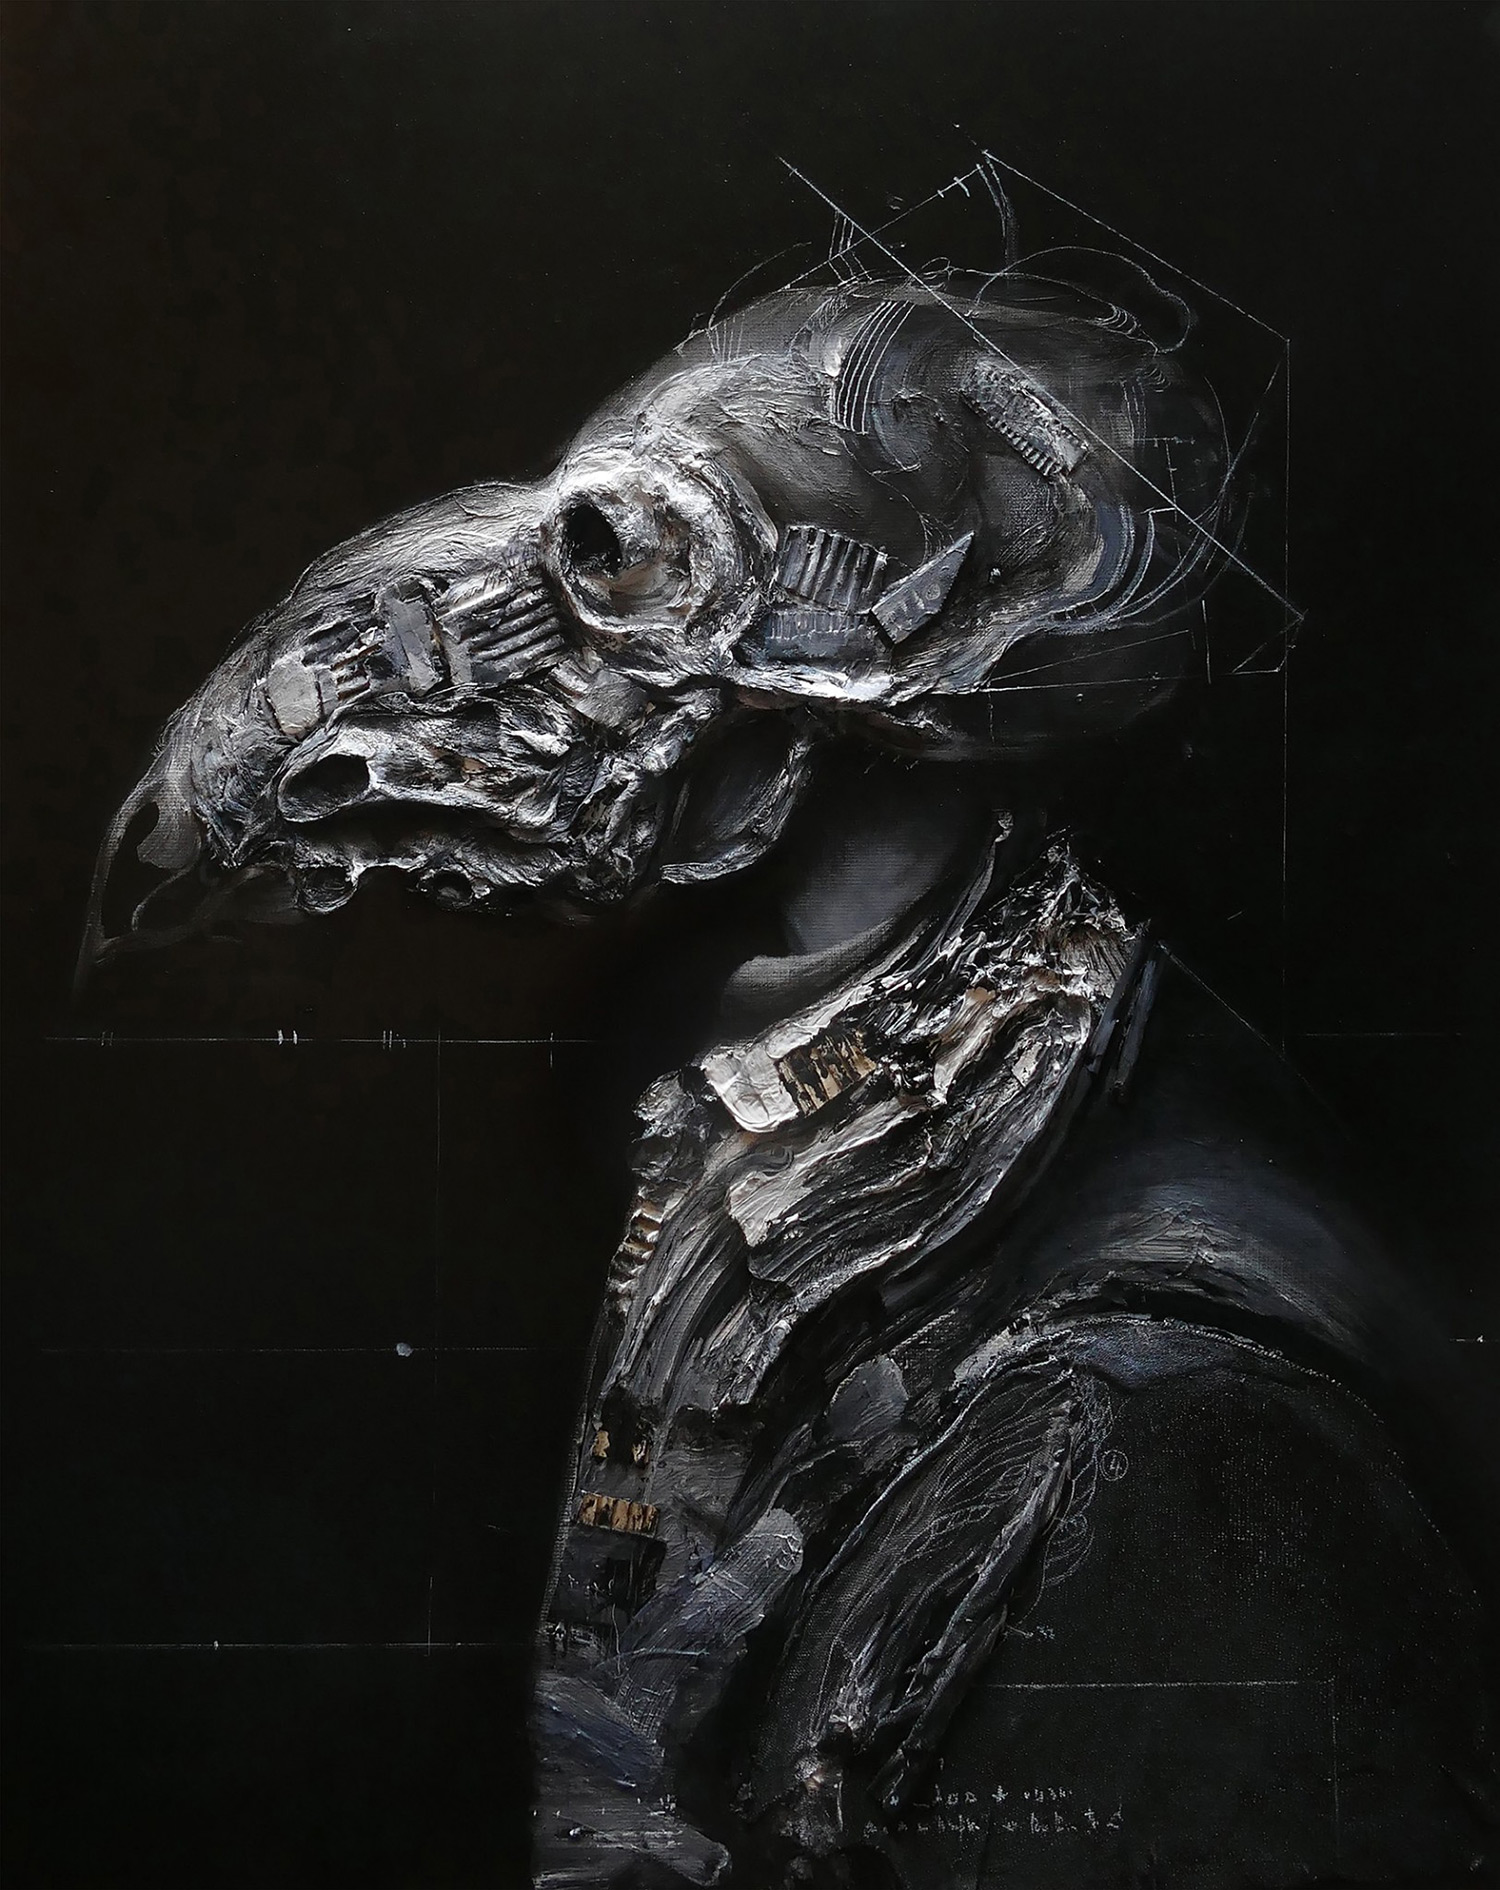 Eric Lacombe - dark industrial skull